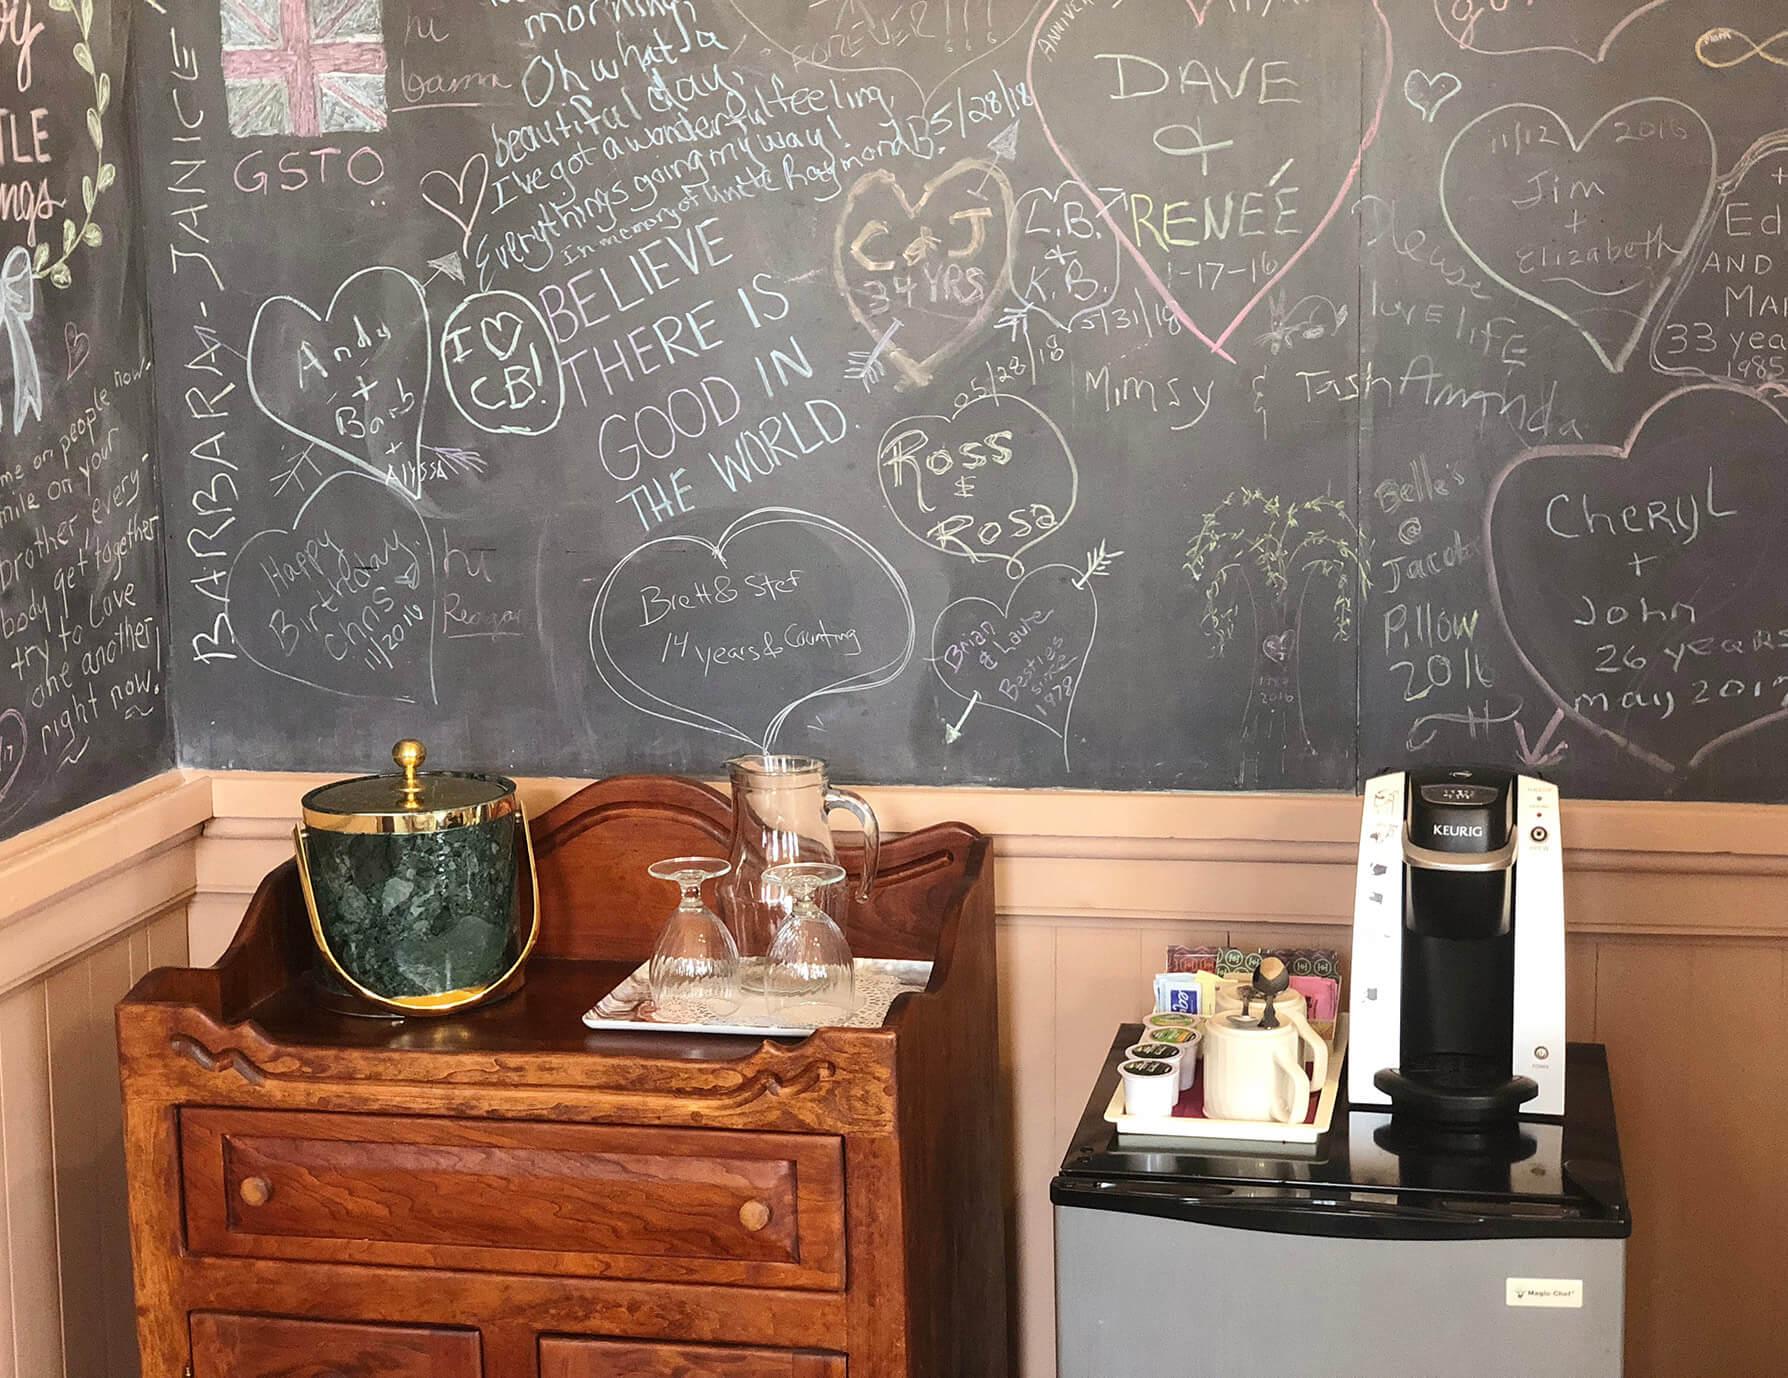 Le Lycee room coffee maker - Berkshires B&B